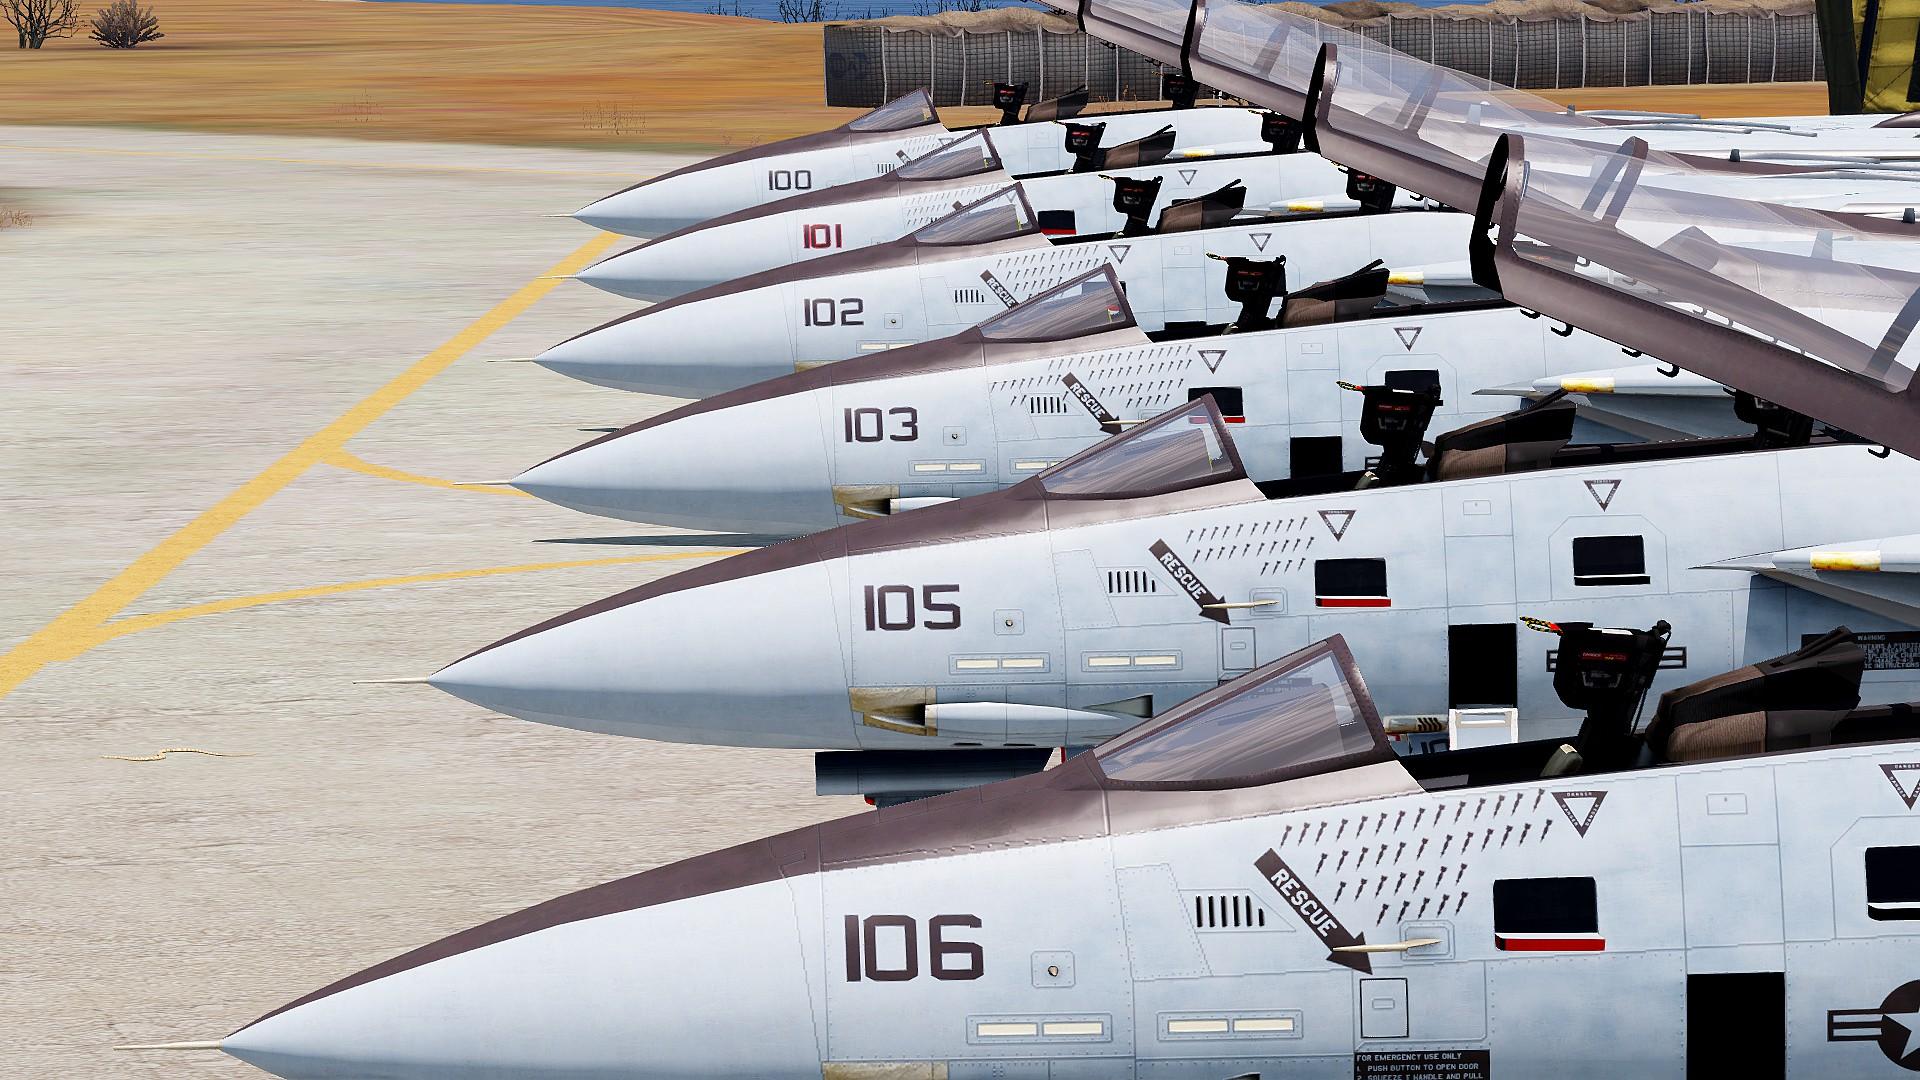 F-14 Tomcat Series Standalone - ARMA 3 - ADDONS & MODS